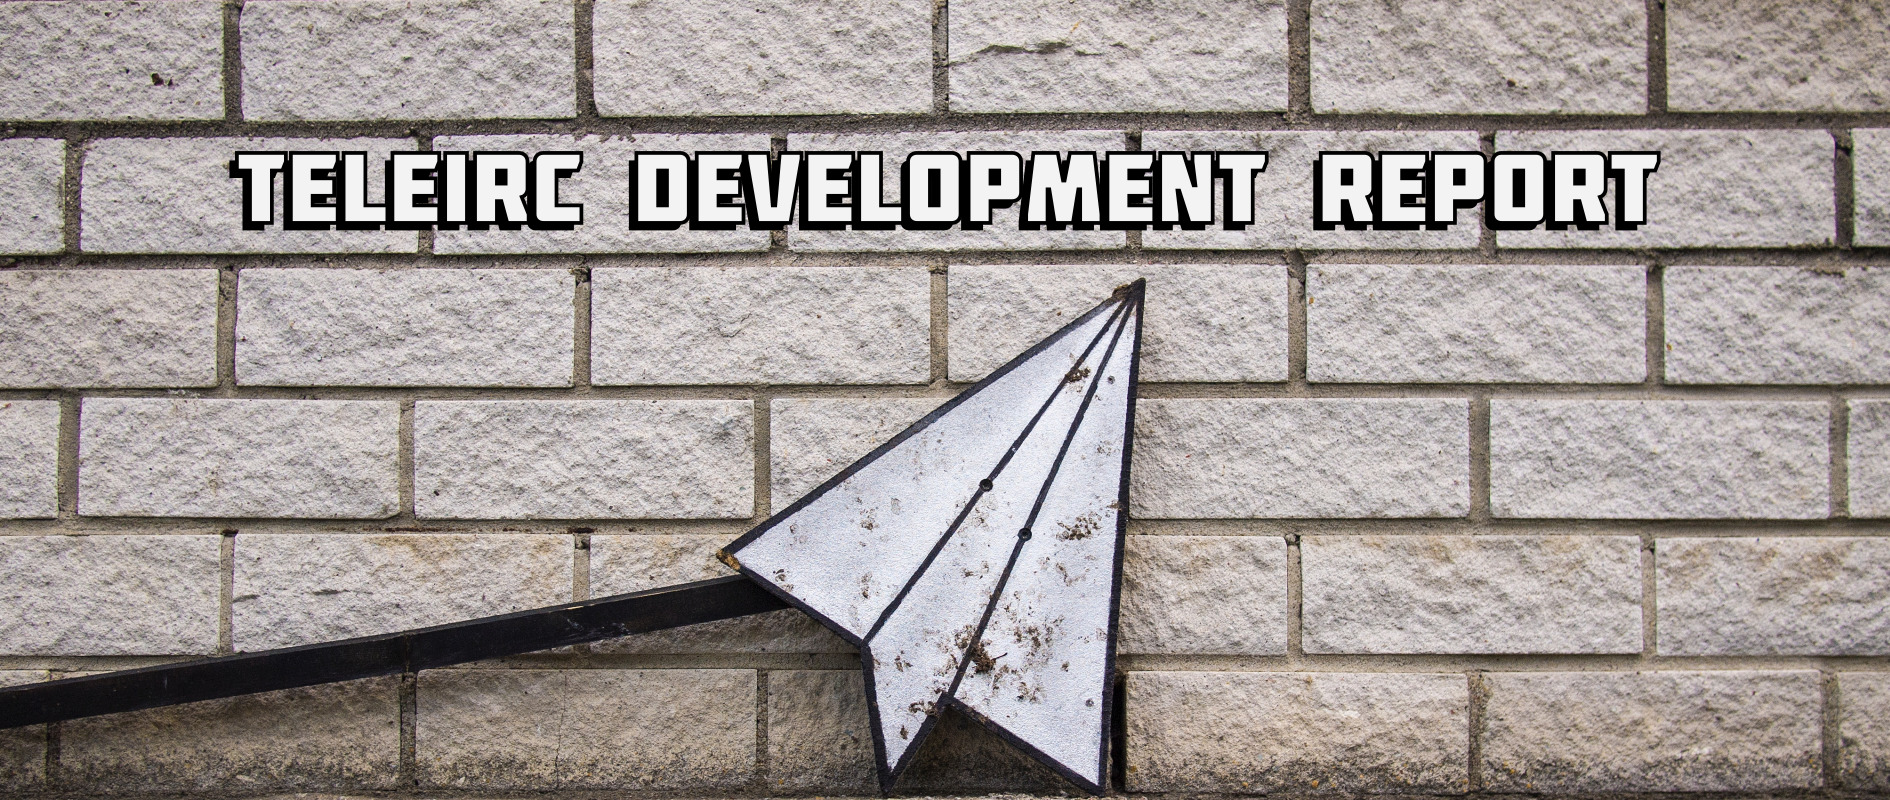 RITlug/teleirc development update